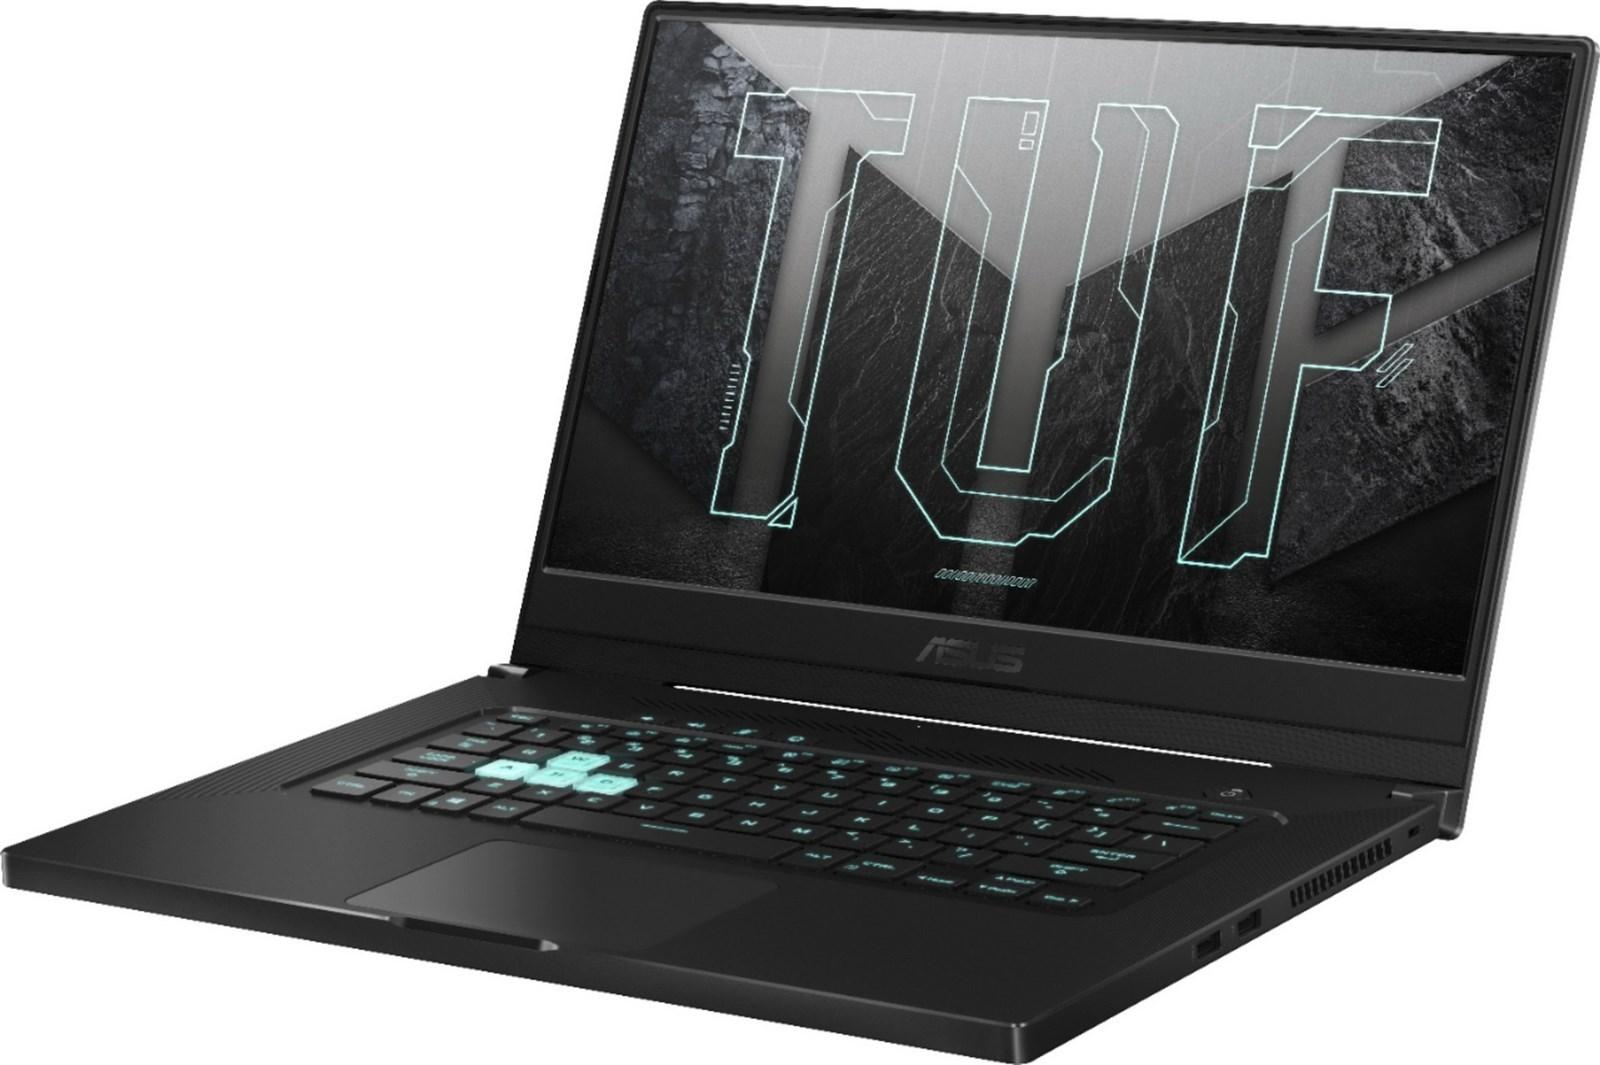 Ноутбук Asus Tuf Dash FX516PM-211.TF15 (90NR05X1-M03100)  - 2